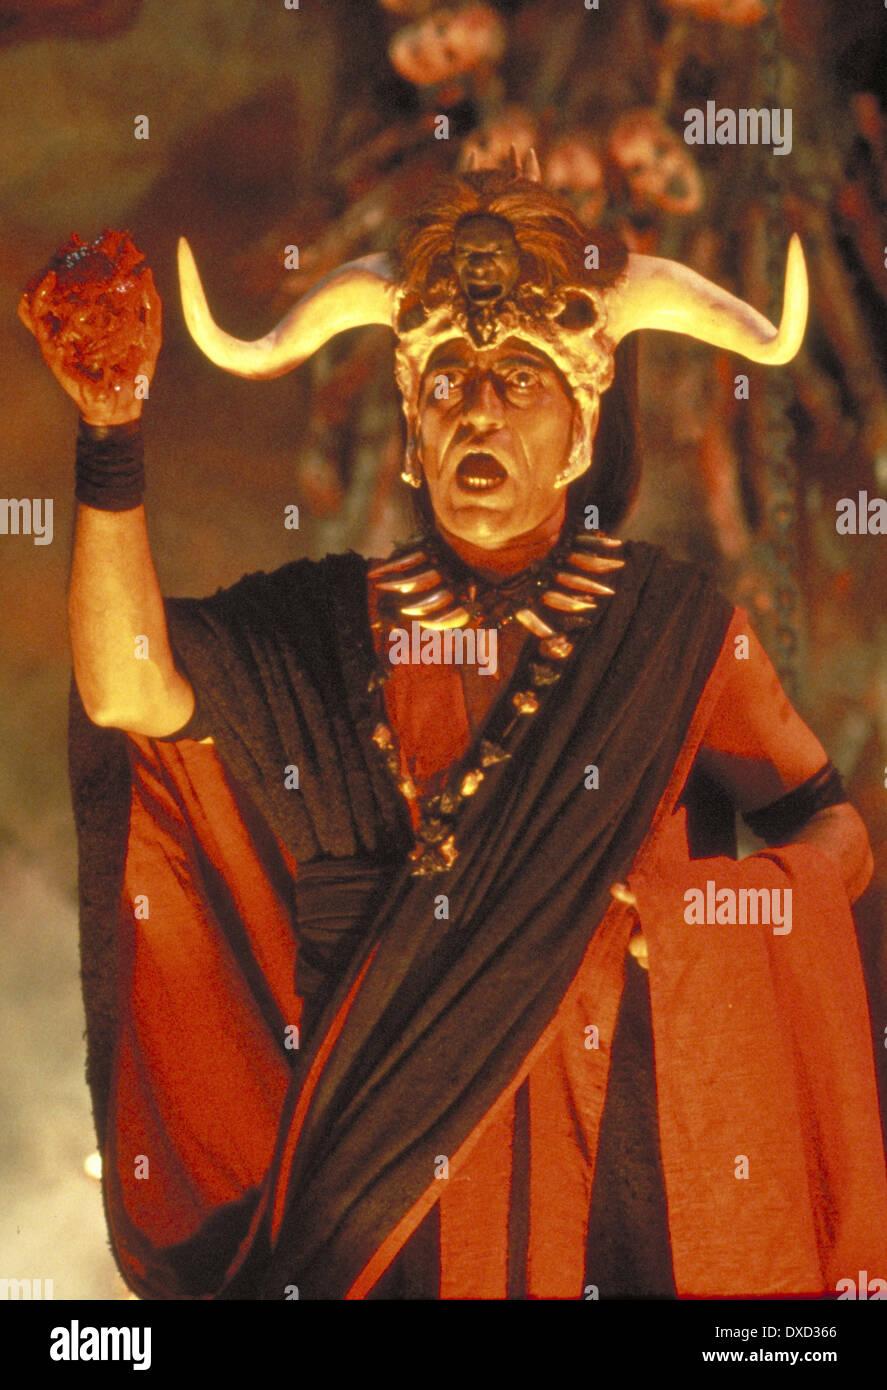 indiana jones and the temple of doom stock photos